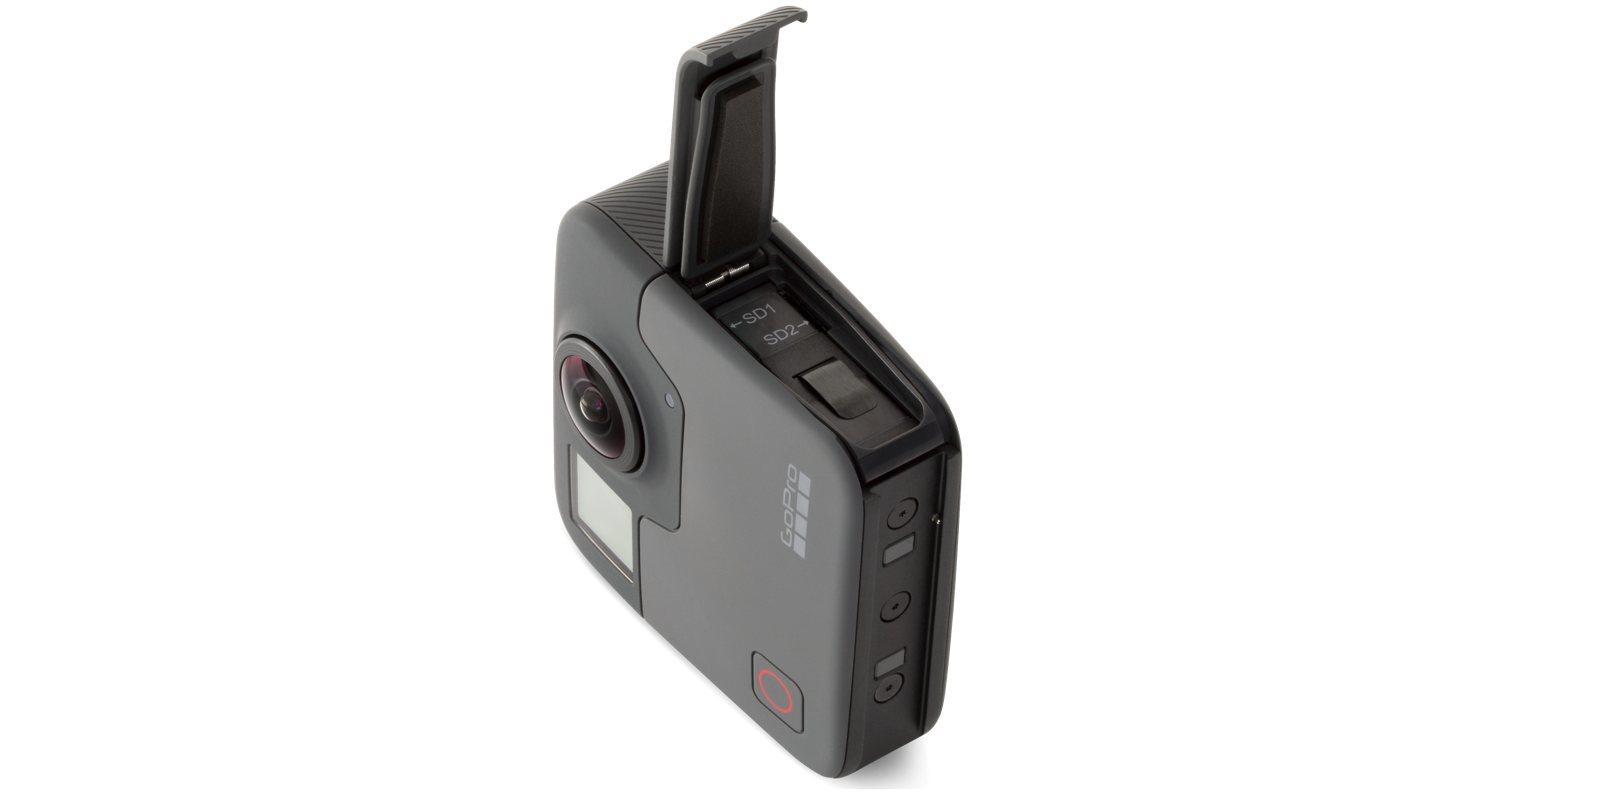 Панорамная камера GoPro Fusion 360 (CHDHZ-103) открыт отсек